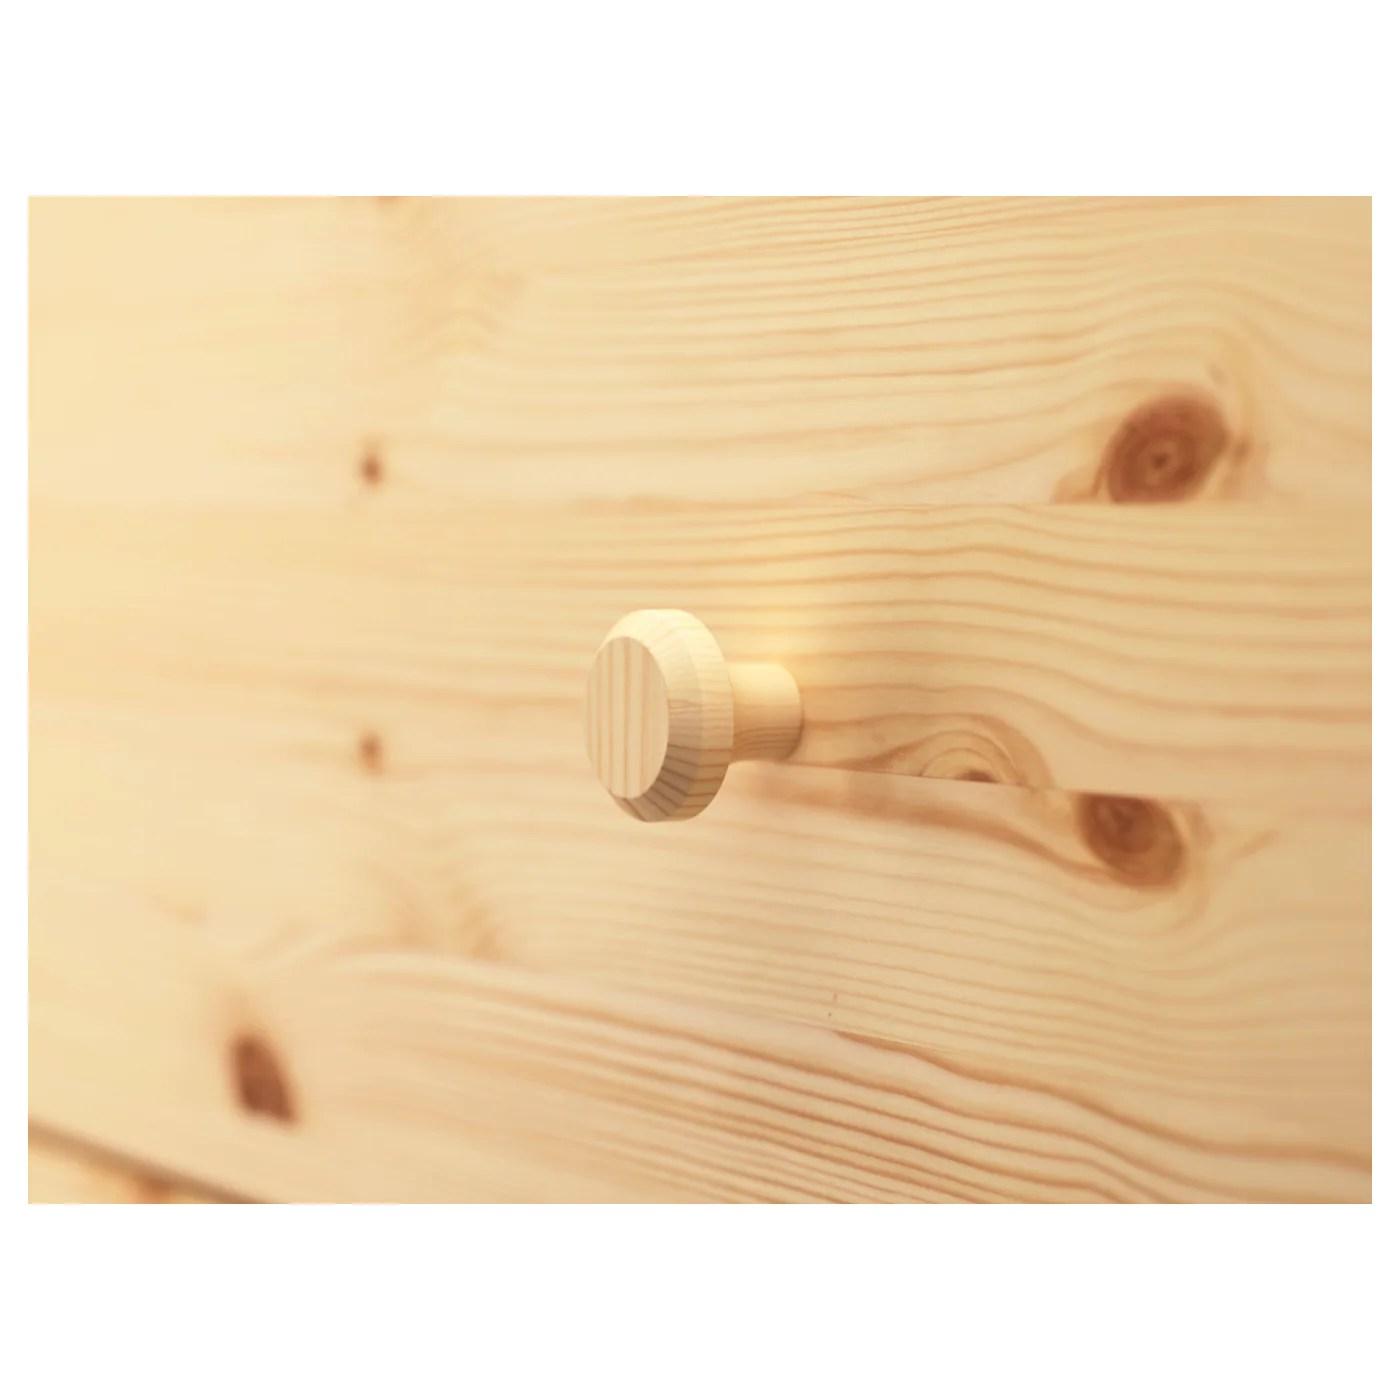 ikea tarva commode 6 tiroirs en bois massif un materiau naturel et resistant a l